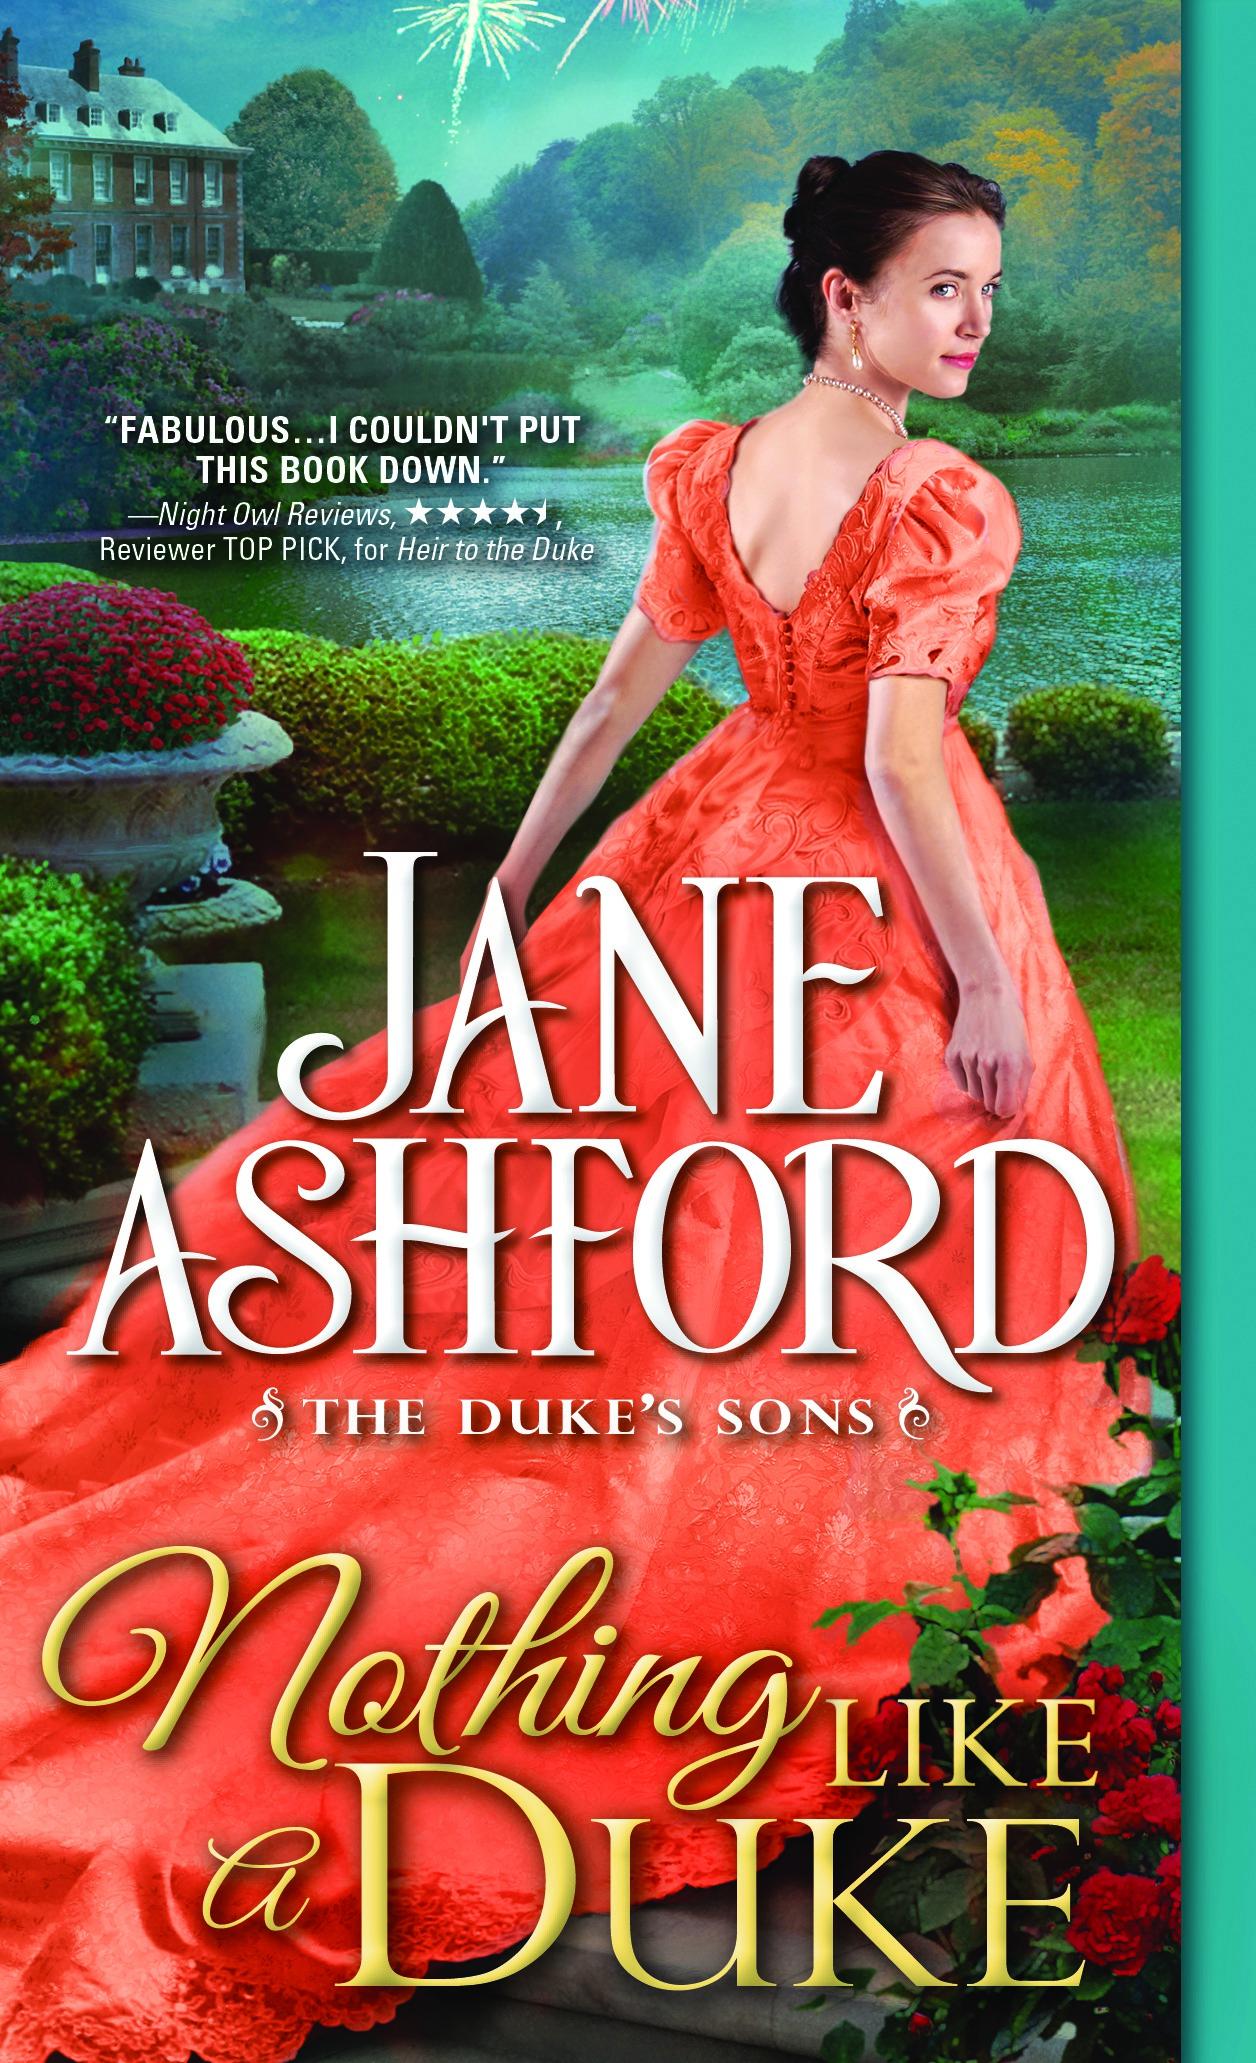 Nothing Like a Dukeby Jane Ashford